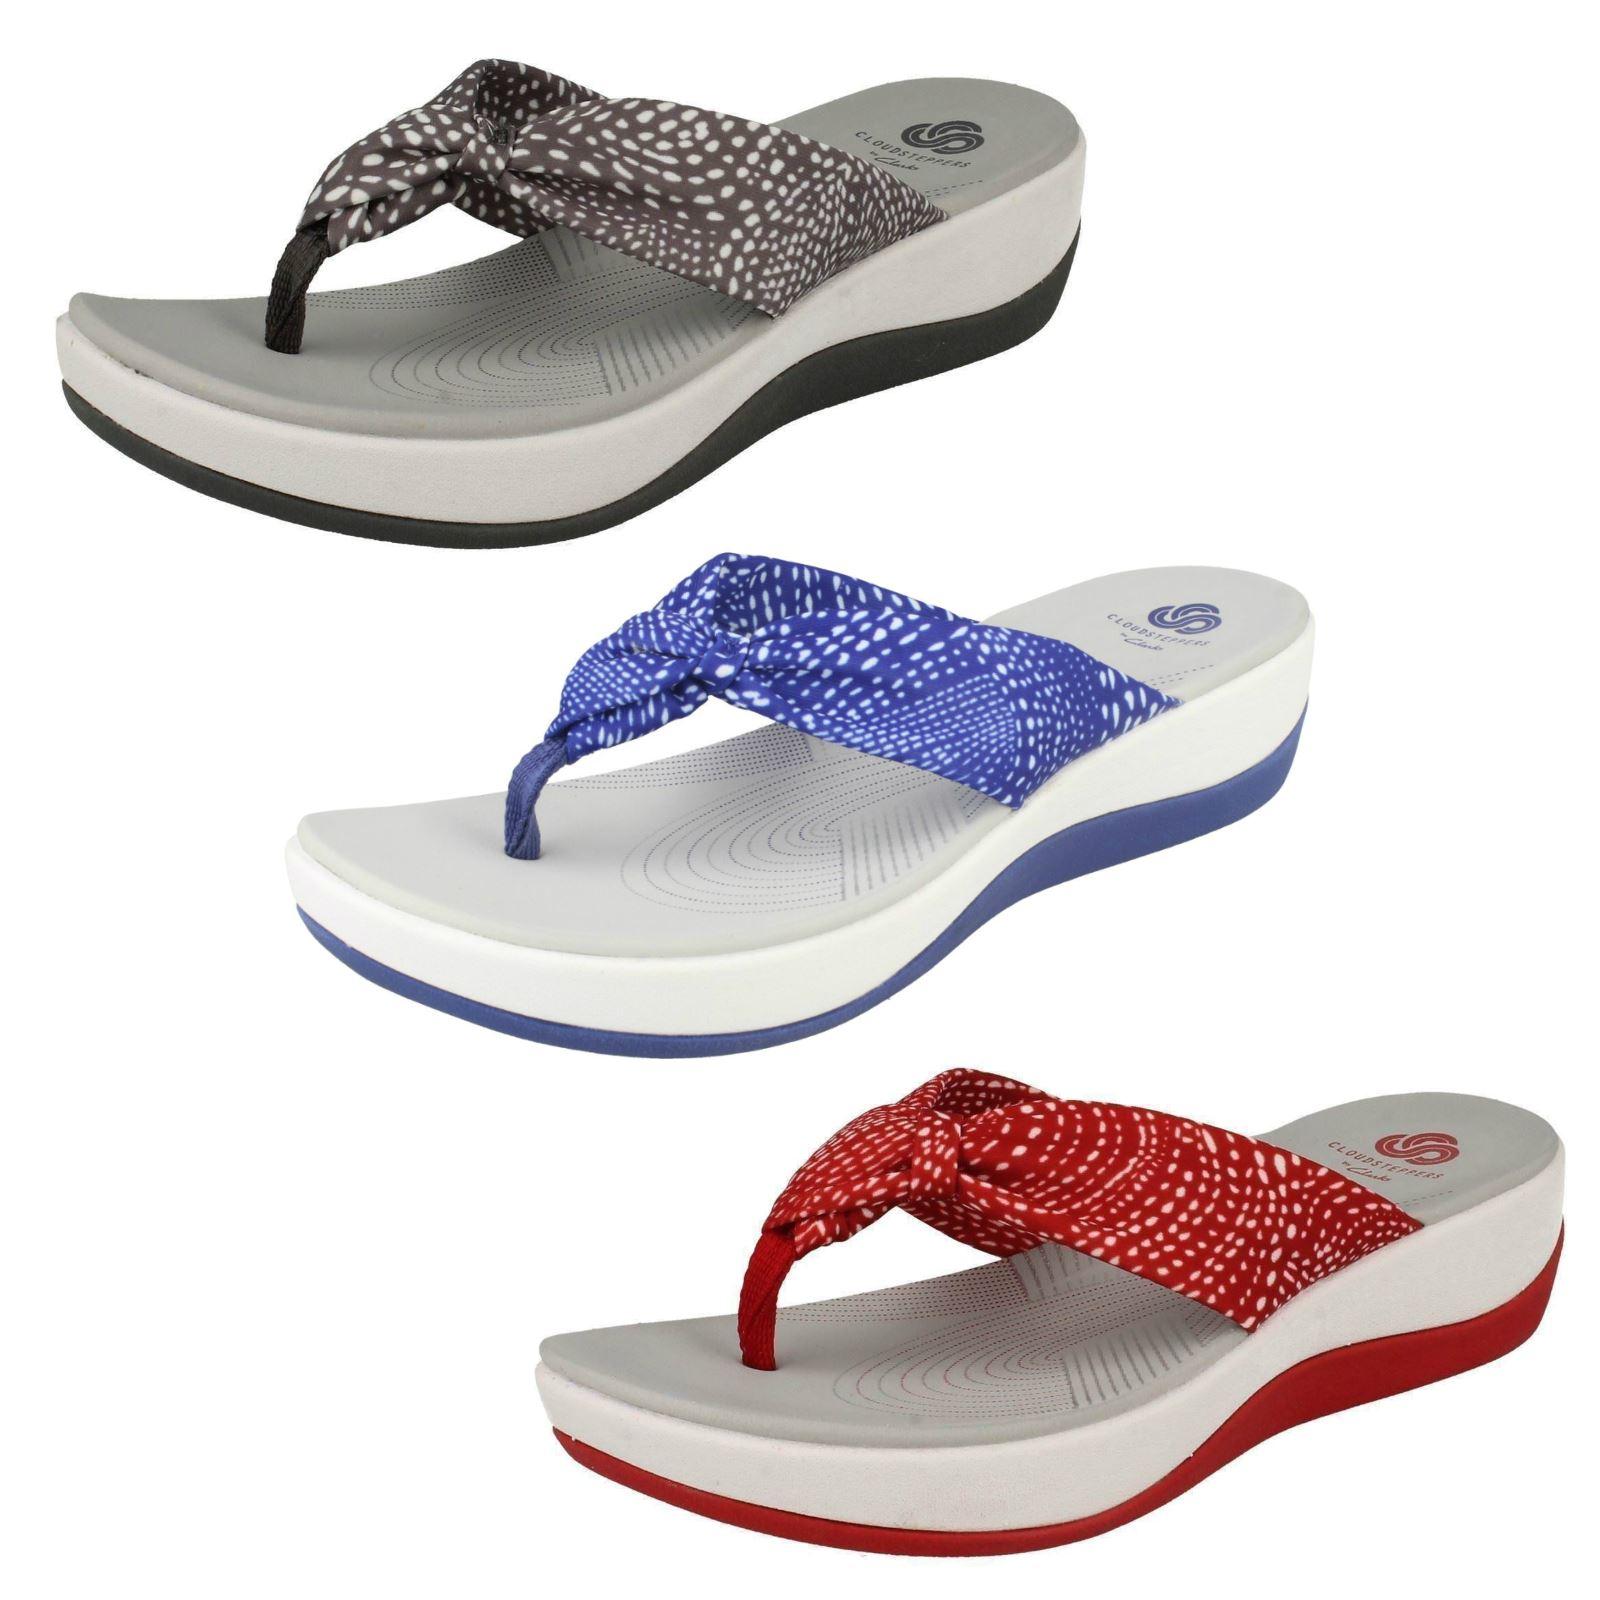 b9cbebf4dcca Ladies Clarks Cloudsteppers Toe Post Summer Sandals  Arla Glison